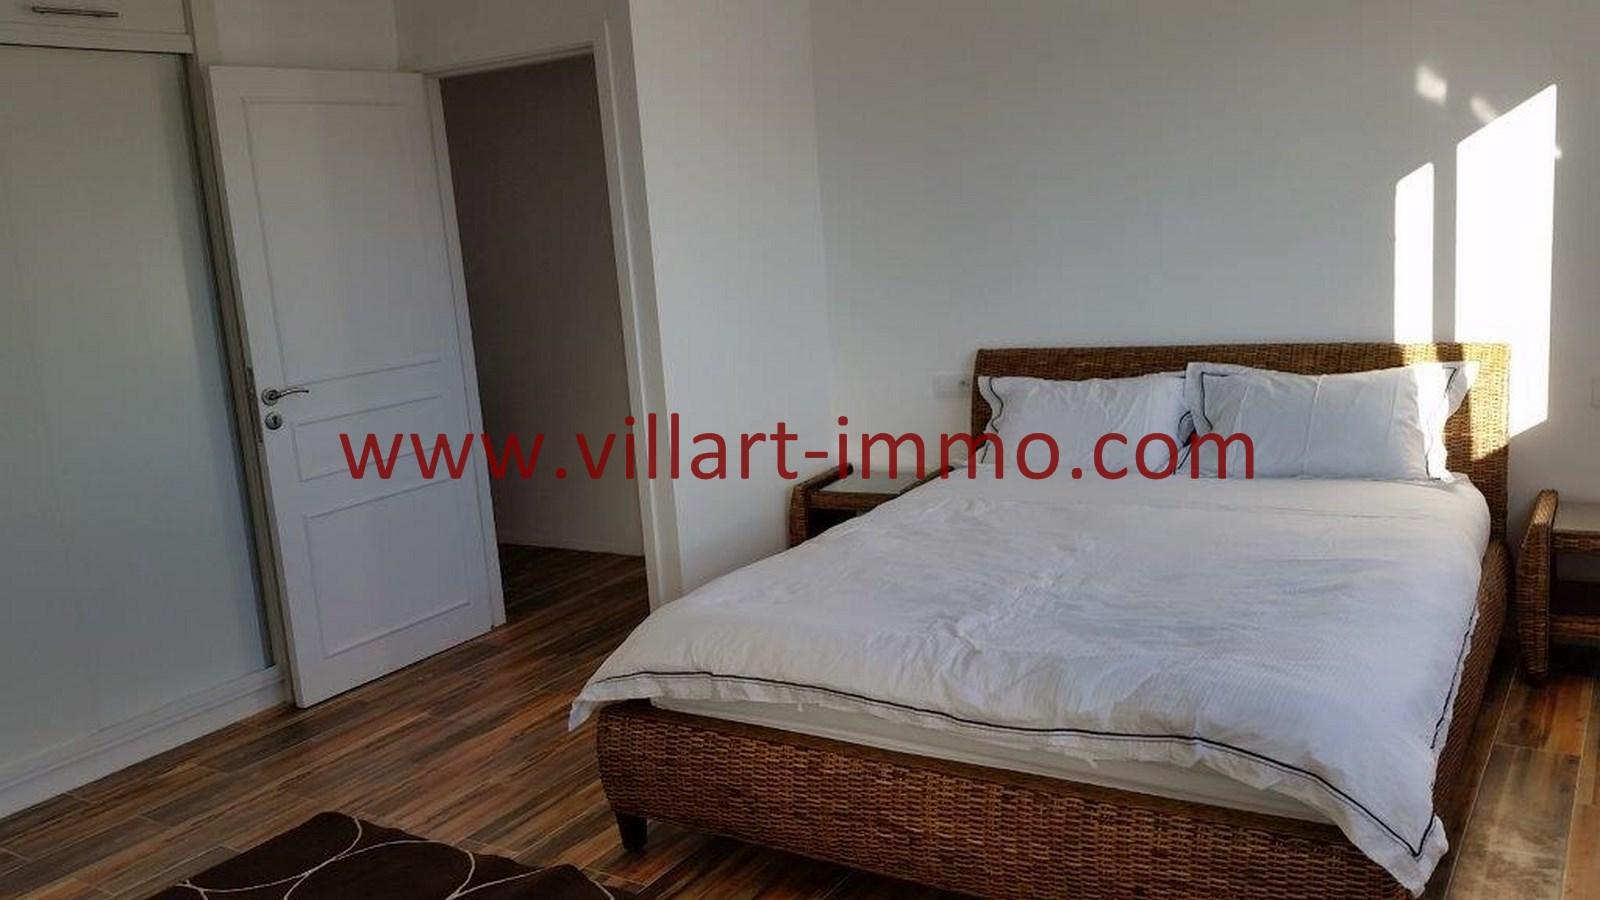 10-Vente-Appartement-Tanger-Centre-De-Ville-Chambre 2-VA518-Villart Immo